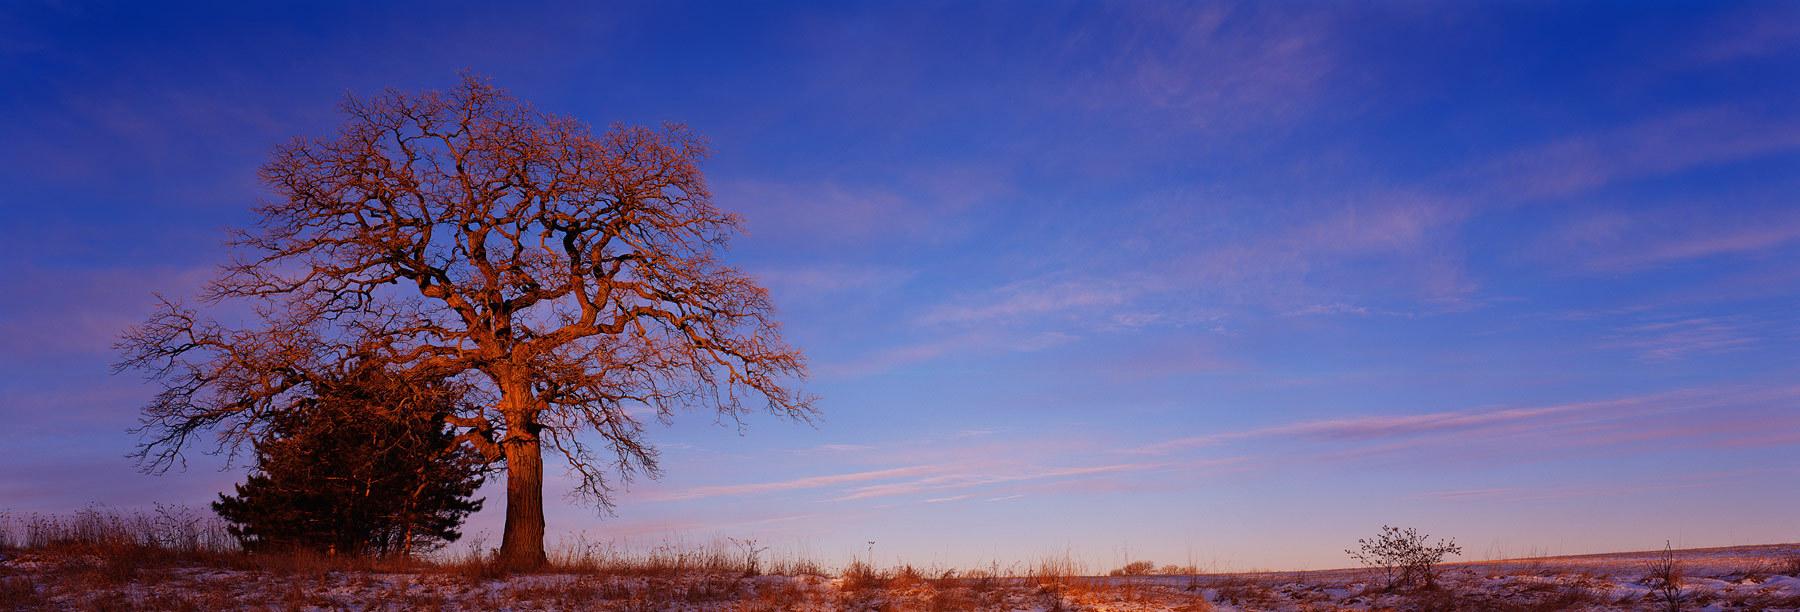 Mighty OakBruce Starrenburg Photography